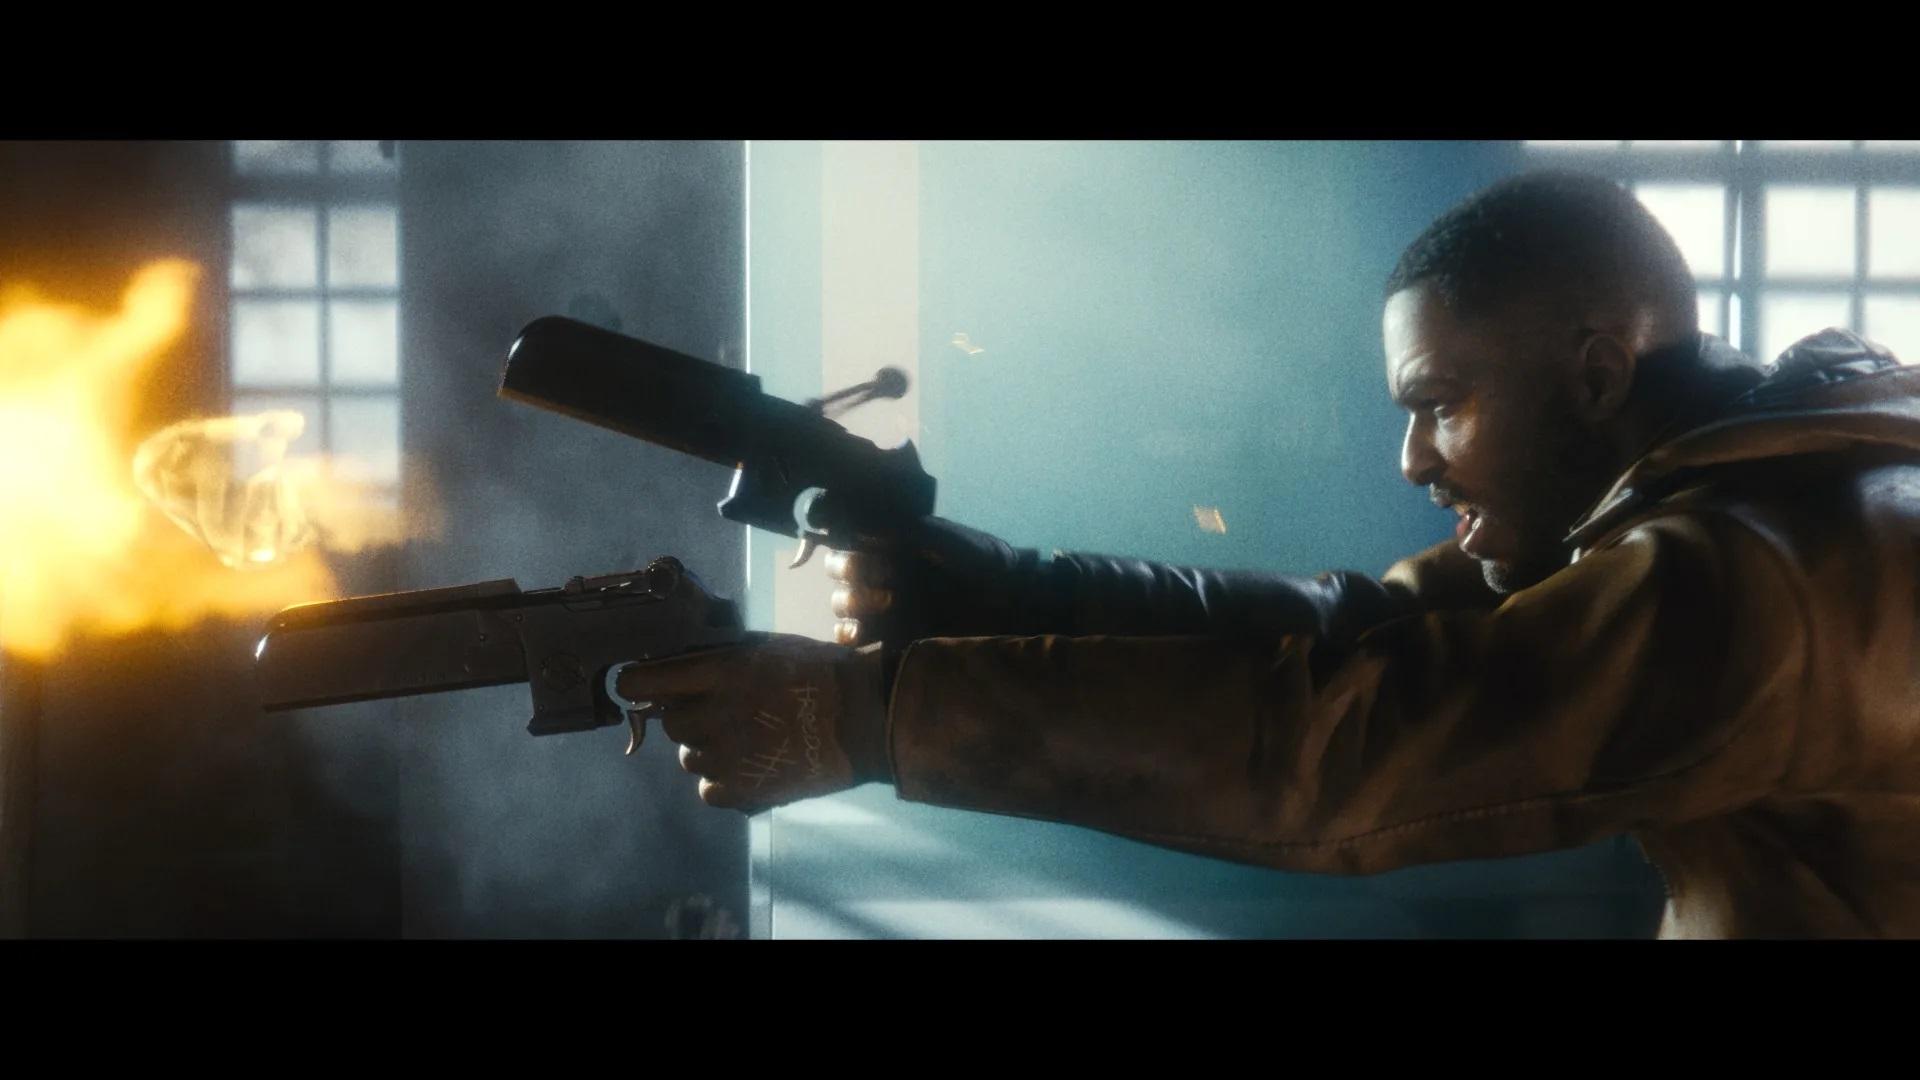 Arkane's Deathloop goes guns blazing on May 21, 2021 screenshot